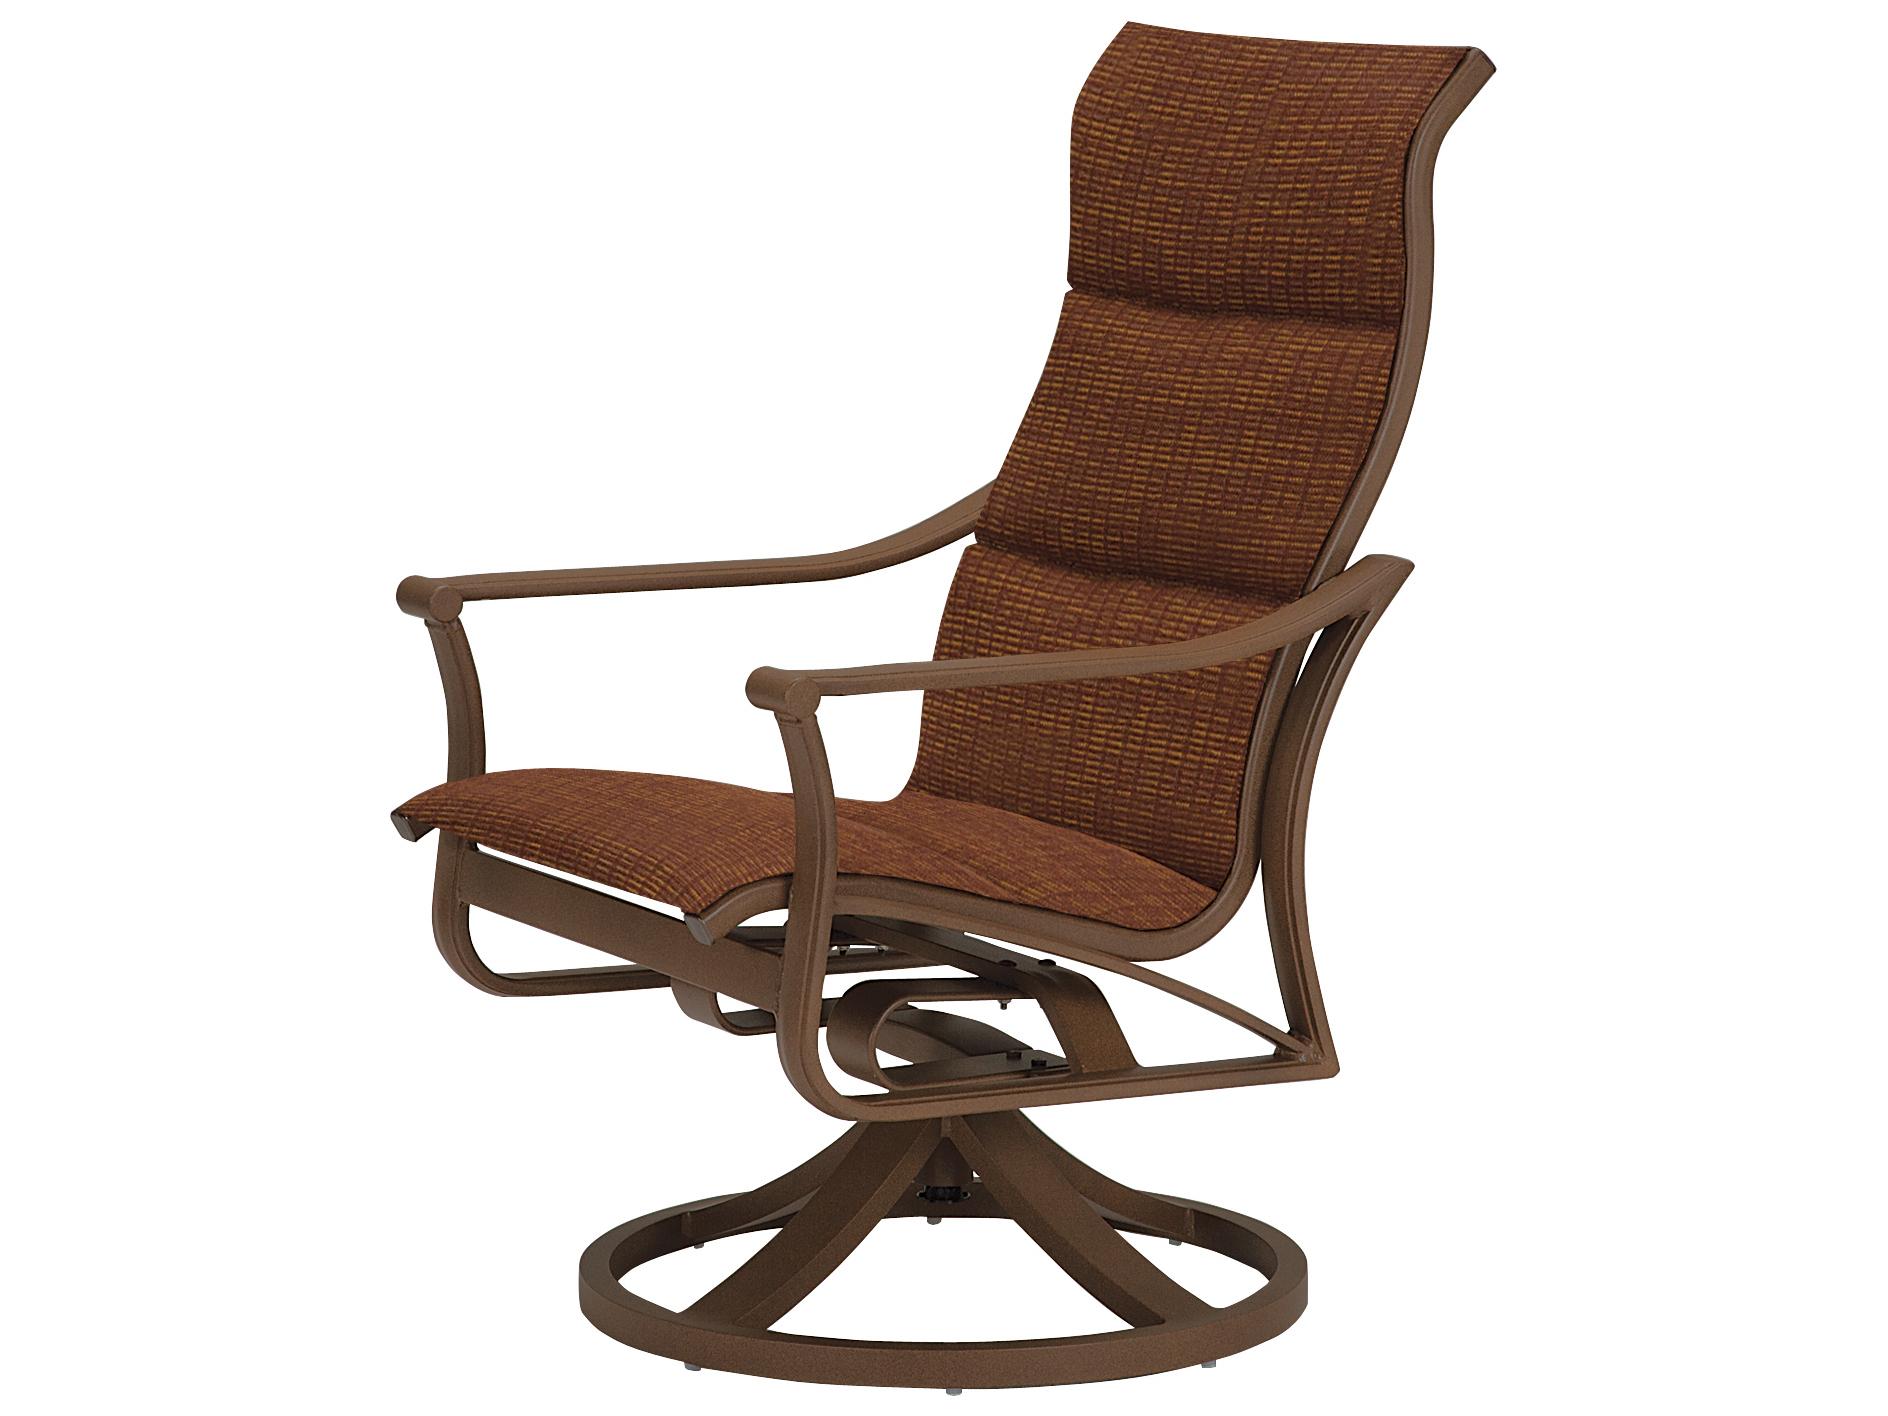 Tropitone Corsica Padded Sling Aluminum High Back Swivel Rocker Lounge Chair Pertaining To Most Popular Padded Sling High Back Swivel Chairs (Gallery 20 of 30)